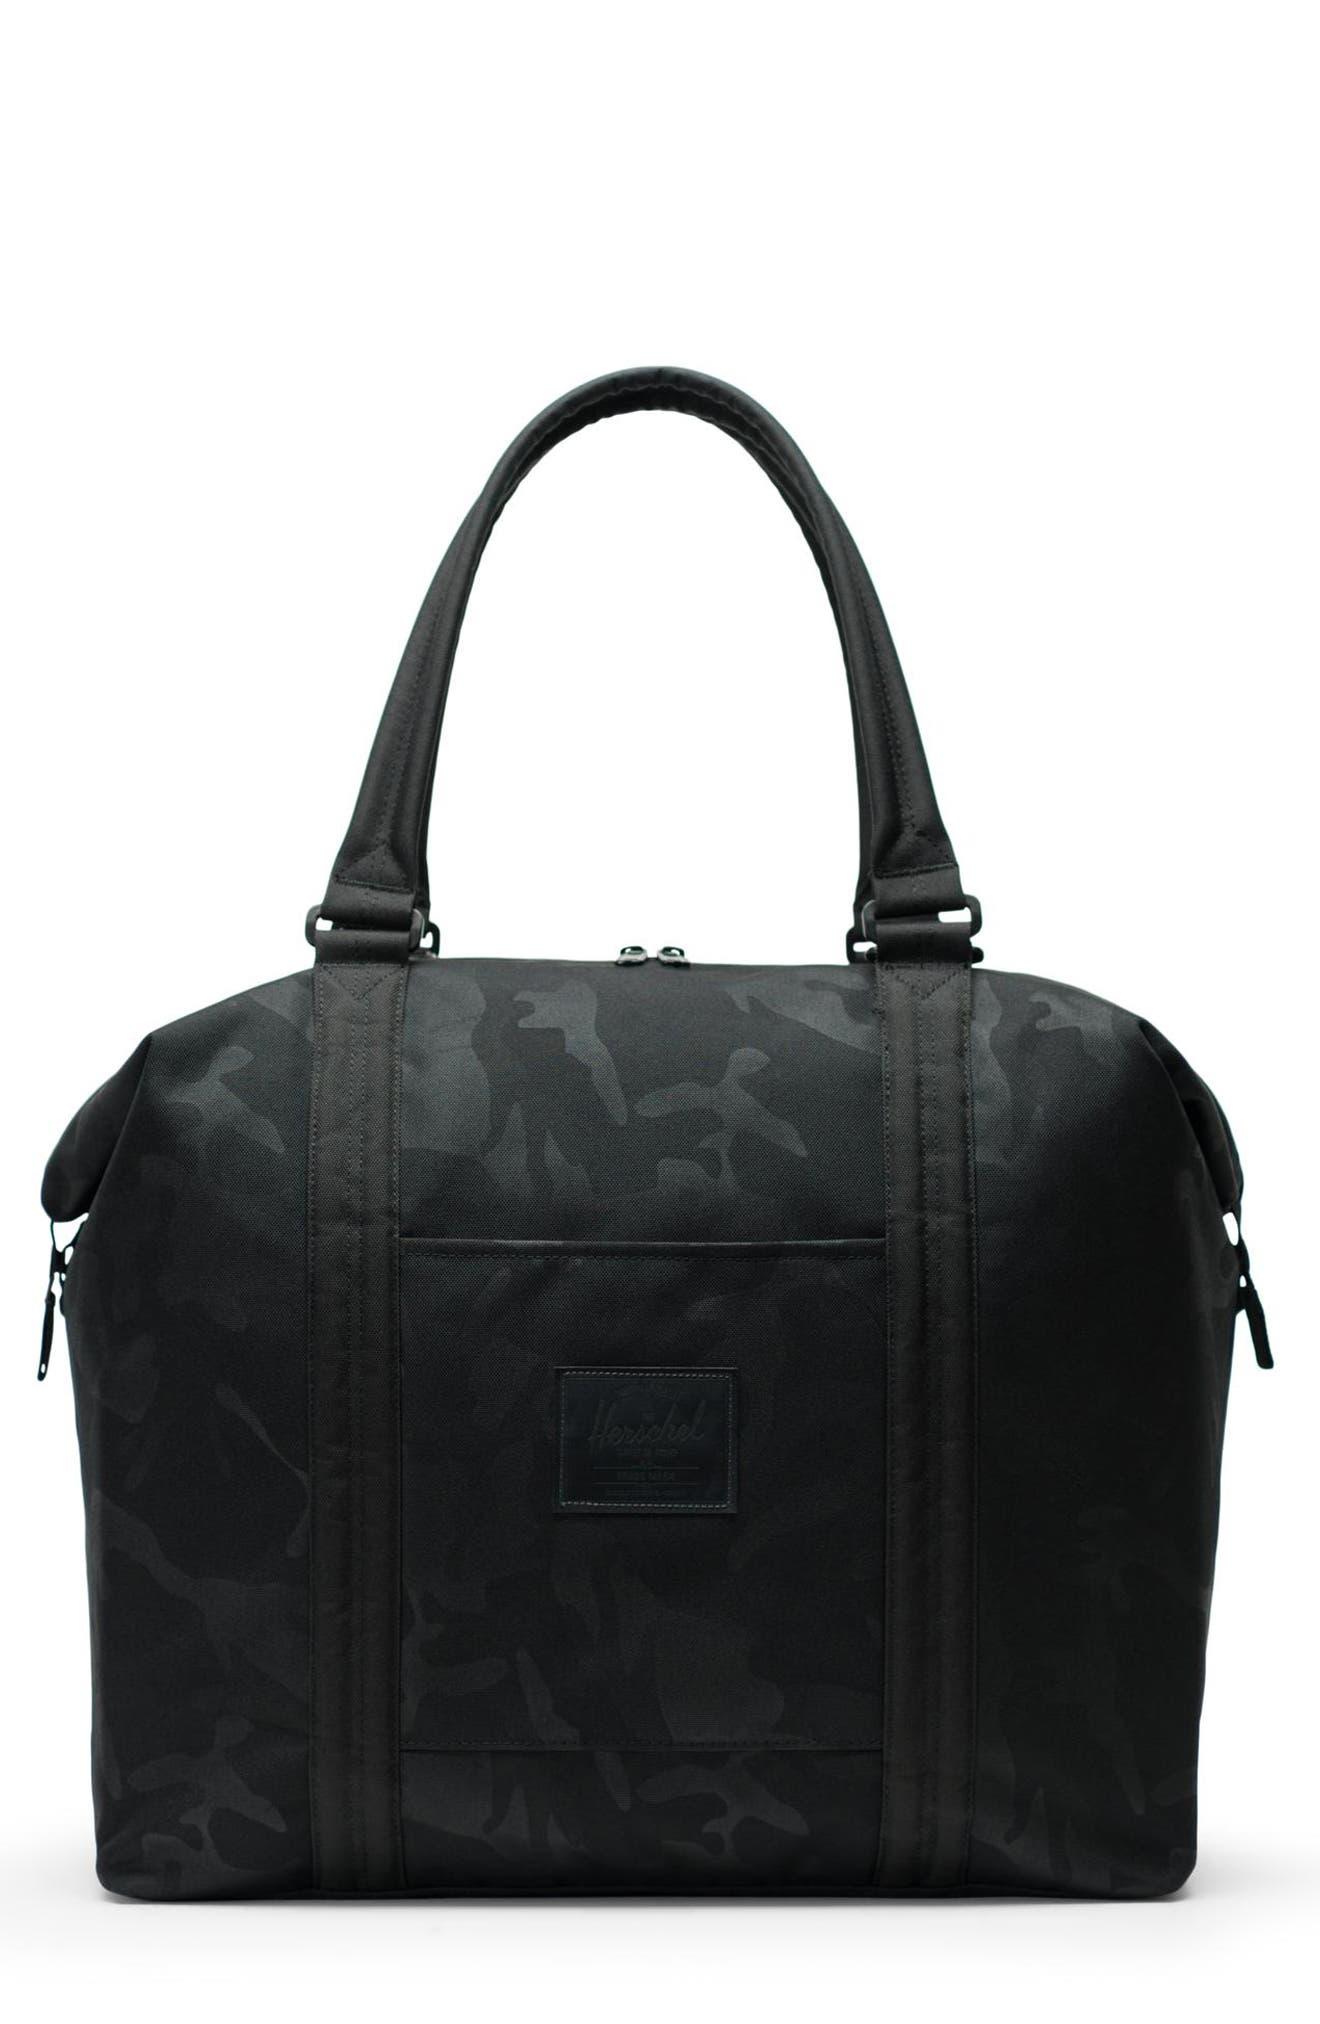 HERSCHEL SUPPLY CO. Strand XL Tote Bag, Main, color, BLACK/ TONAL CAMO